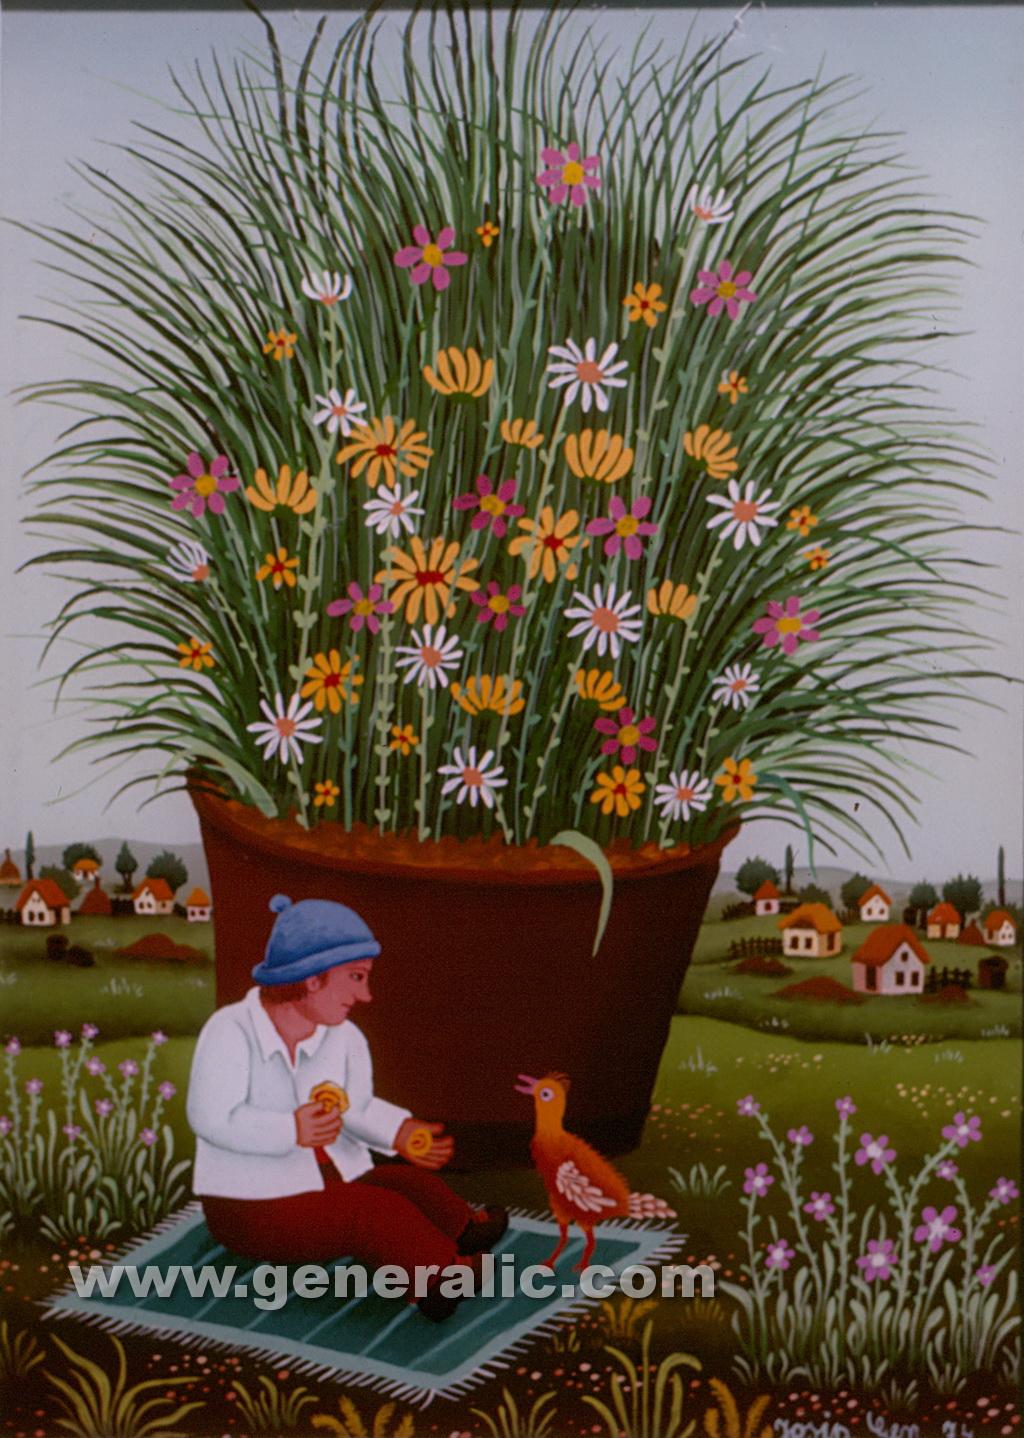 Josip Generalic, 1974, Boy feeding a bird, oil on glass, 35x25 cm